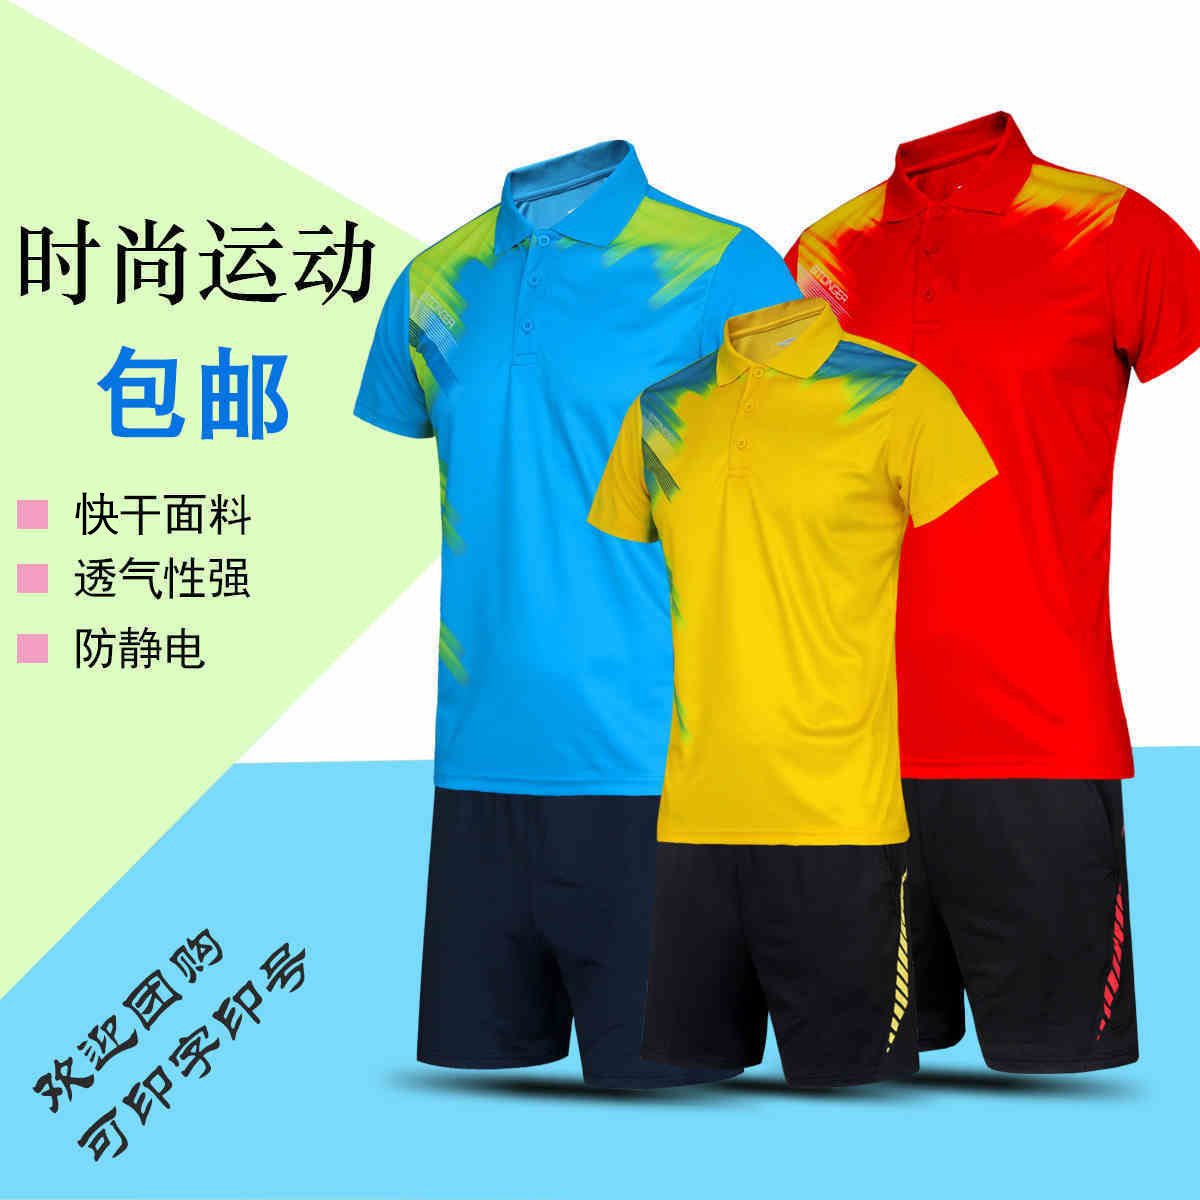 Luwint男款羽毛球服翻领单衣透气网球乒乓排球服短袖运动服